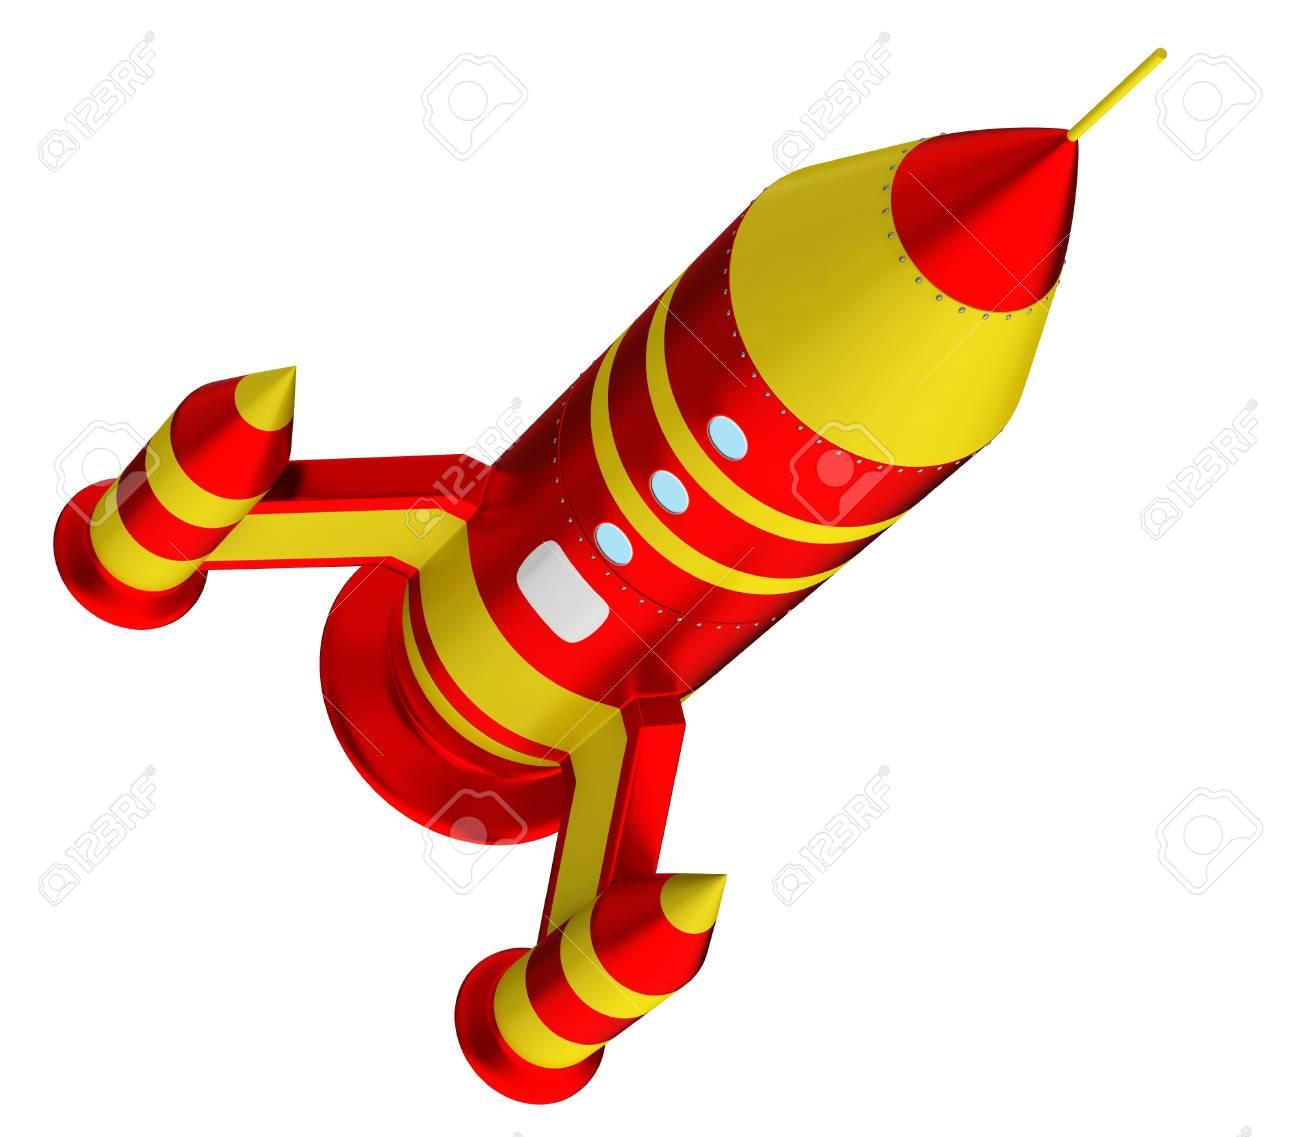 Space Rocket isolated on white background Stock Photo - 15204929